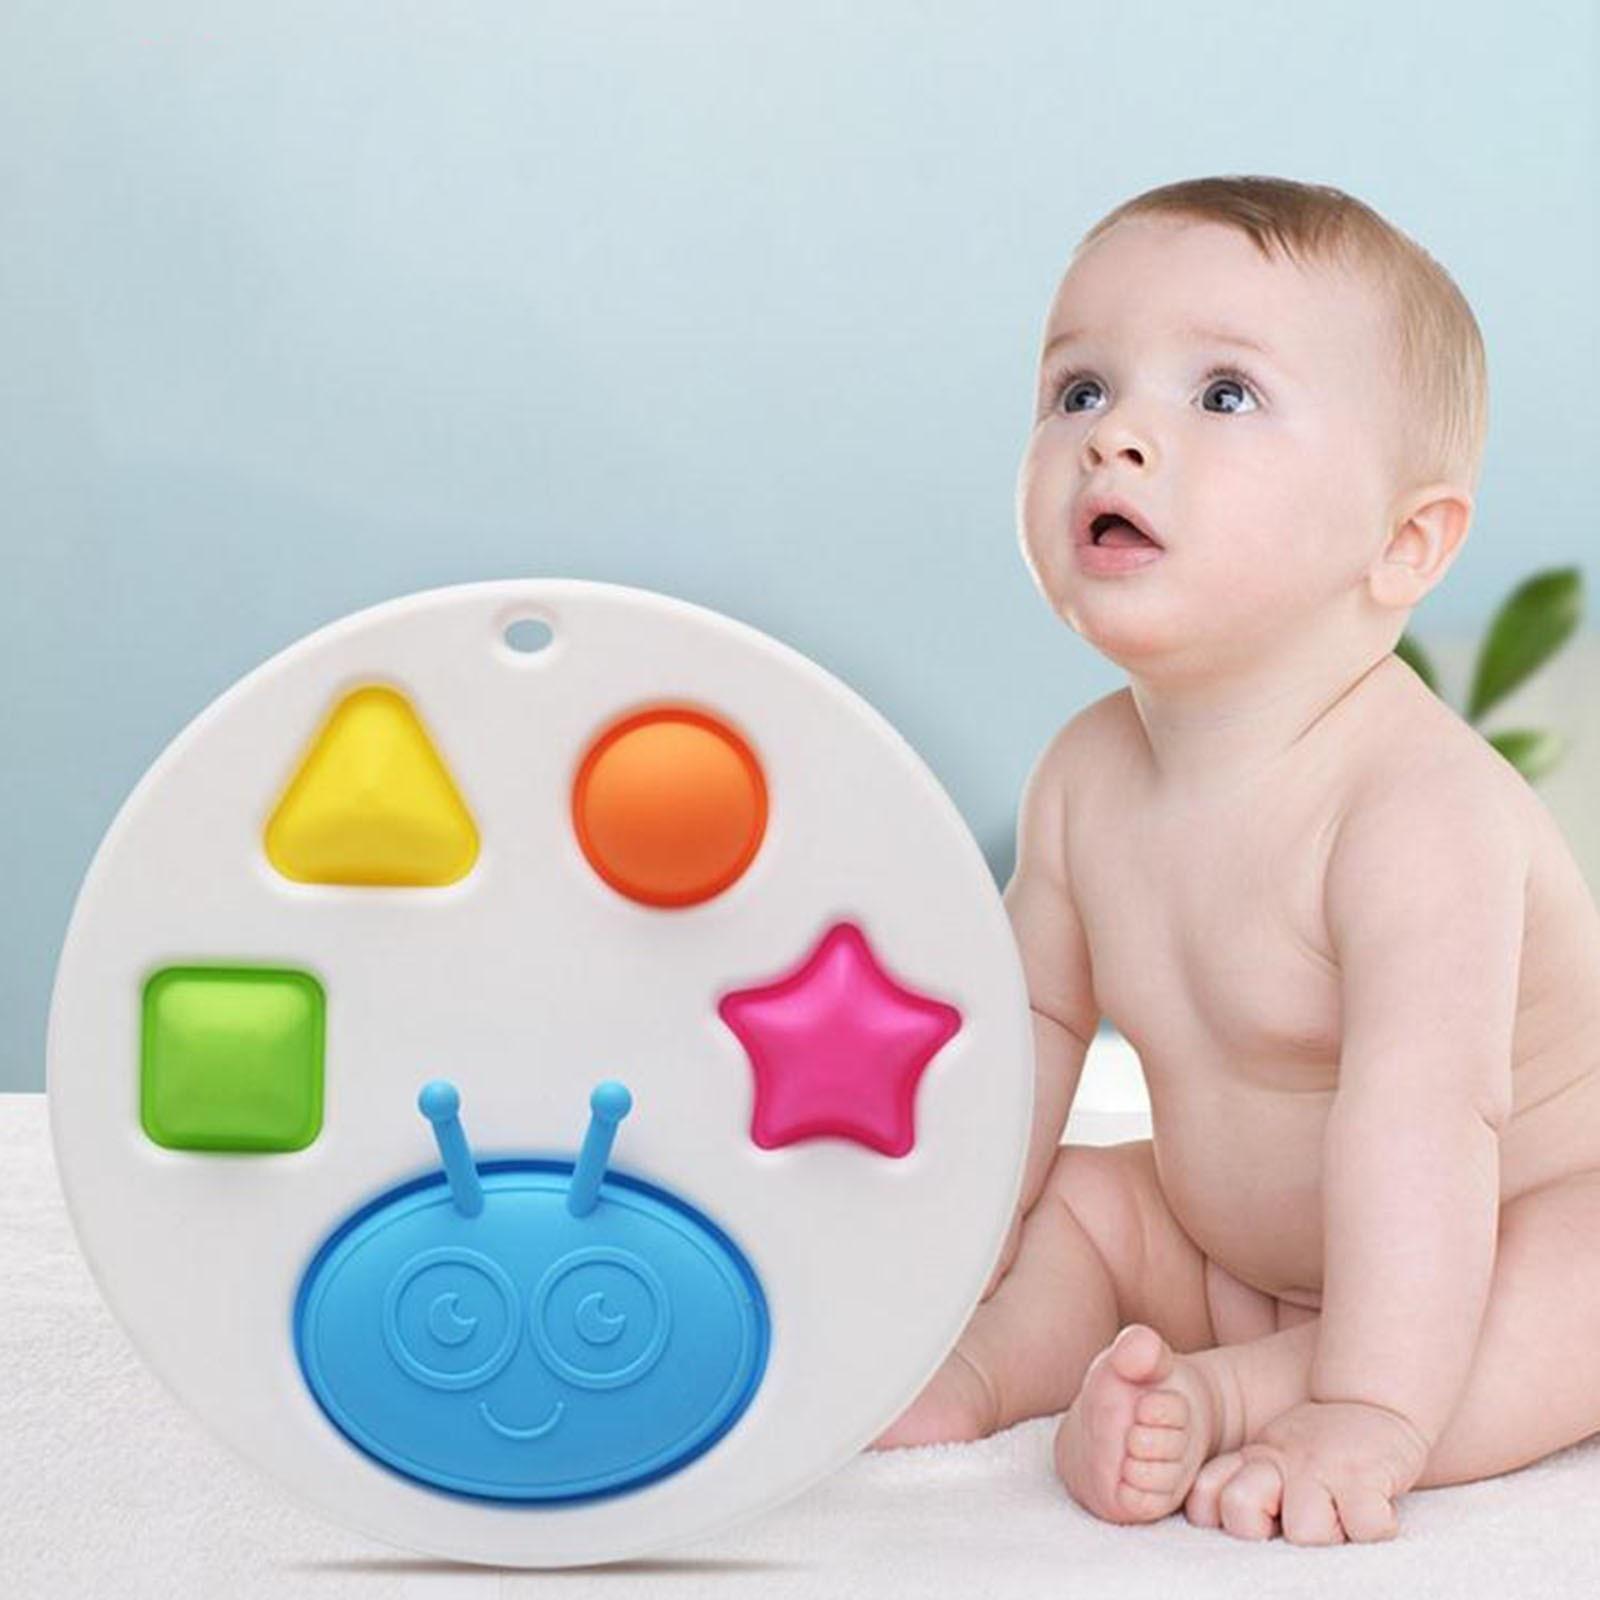 Toy Fidget-Toys Puzzle Baby-Toy Training Simple Dimple It-Sensory Pops Brain-Development-Enlightenment img4